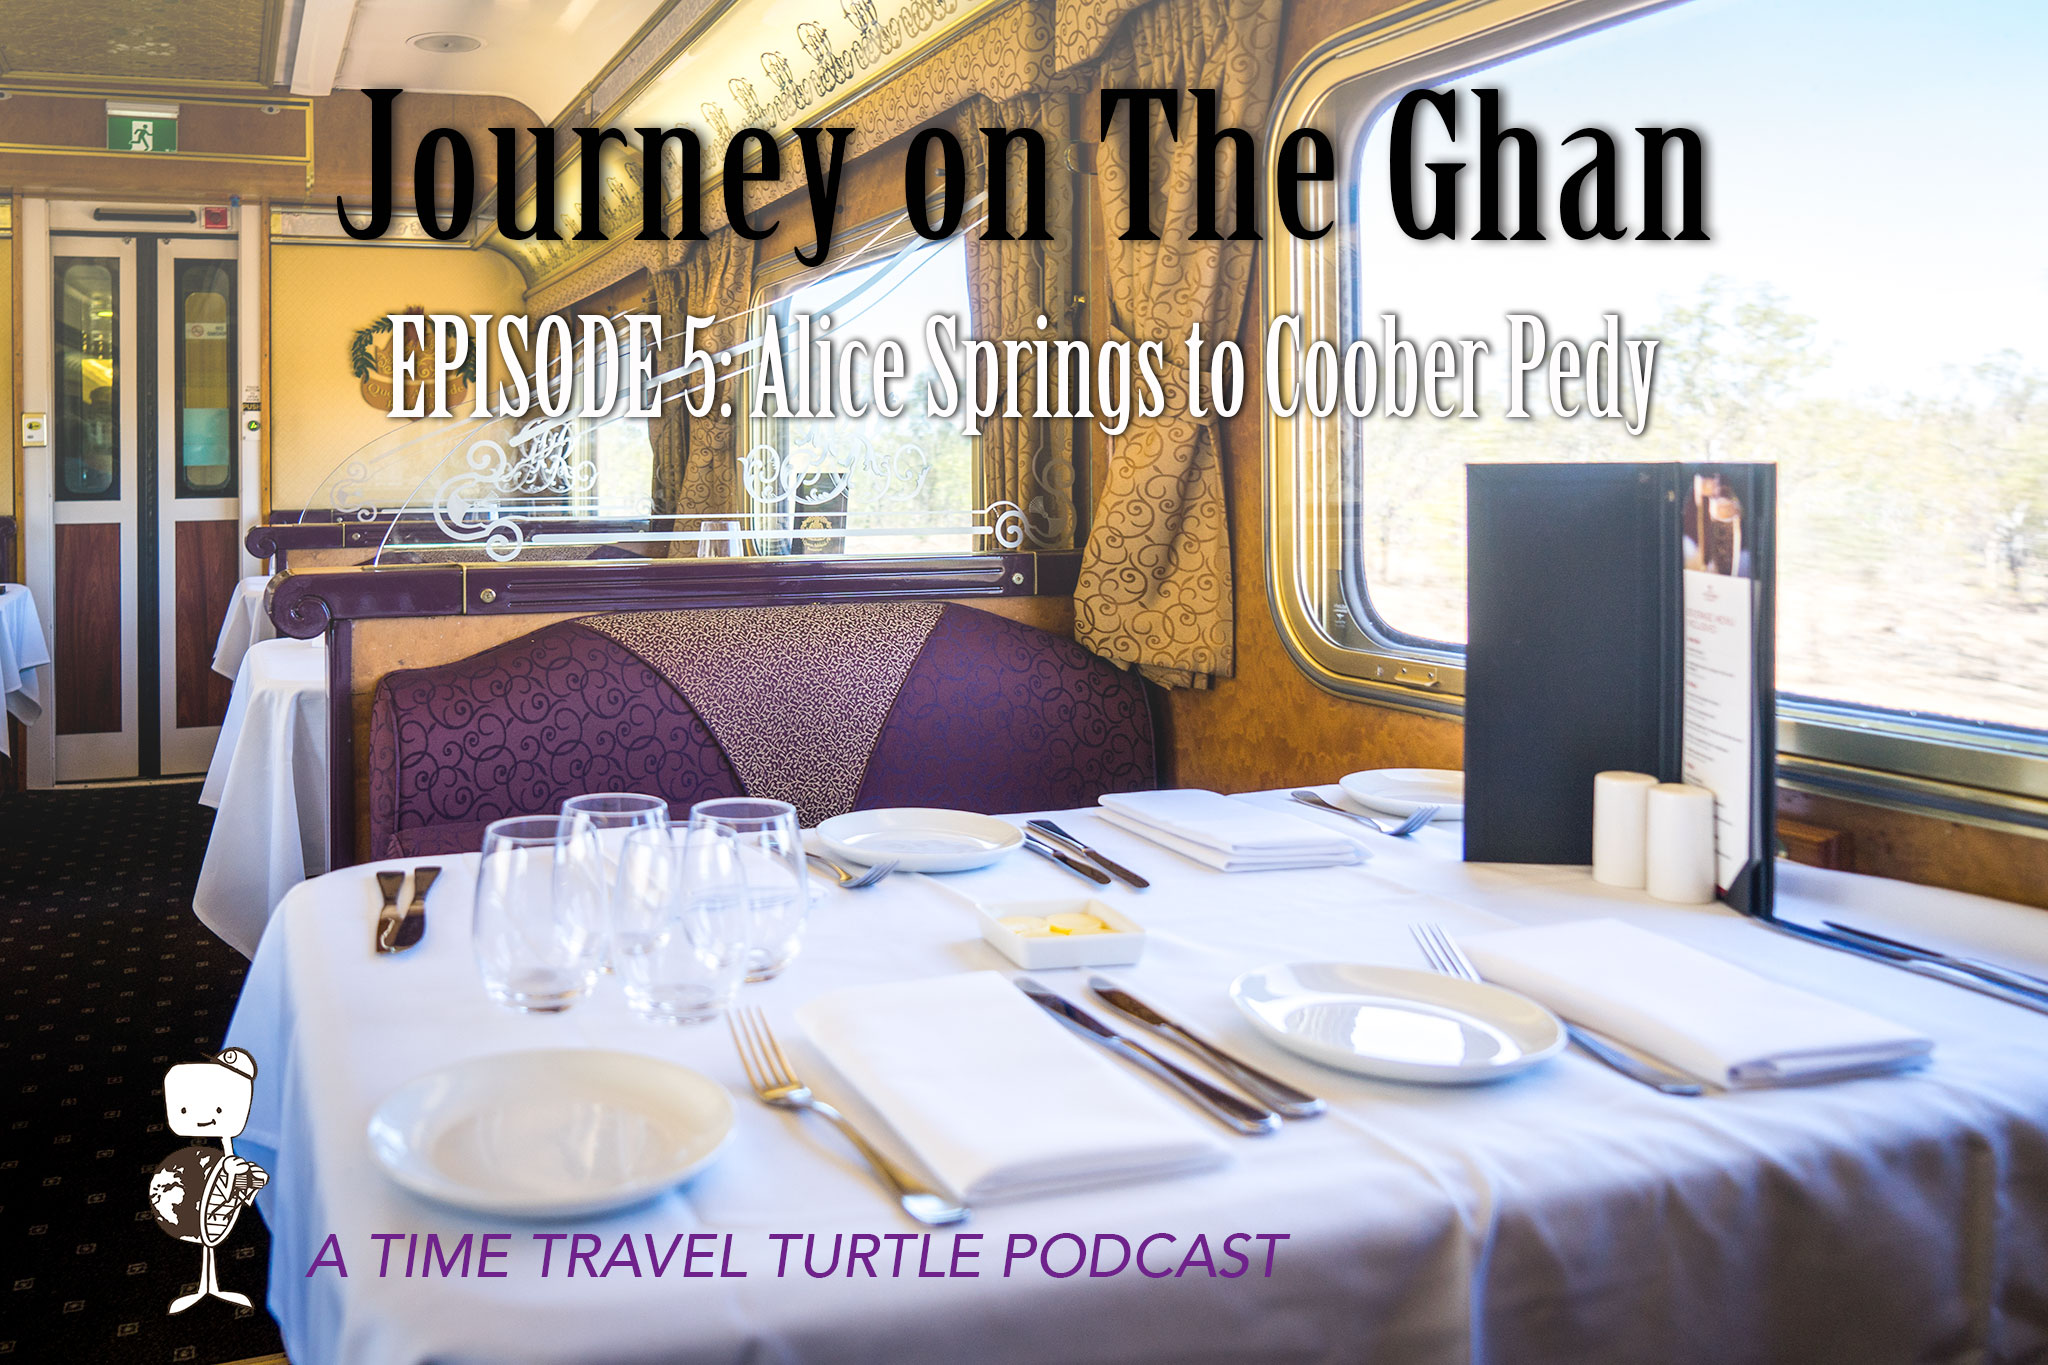 Episode 5: Alice Springs to Coober Pedy